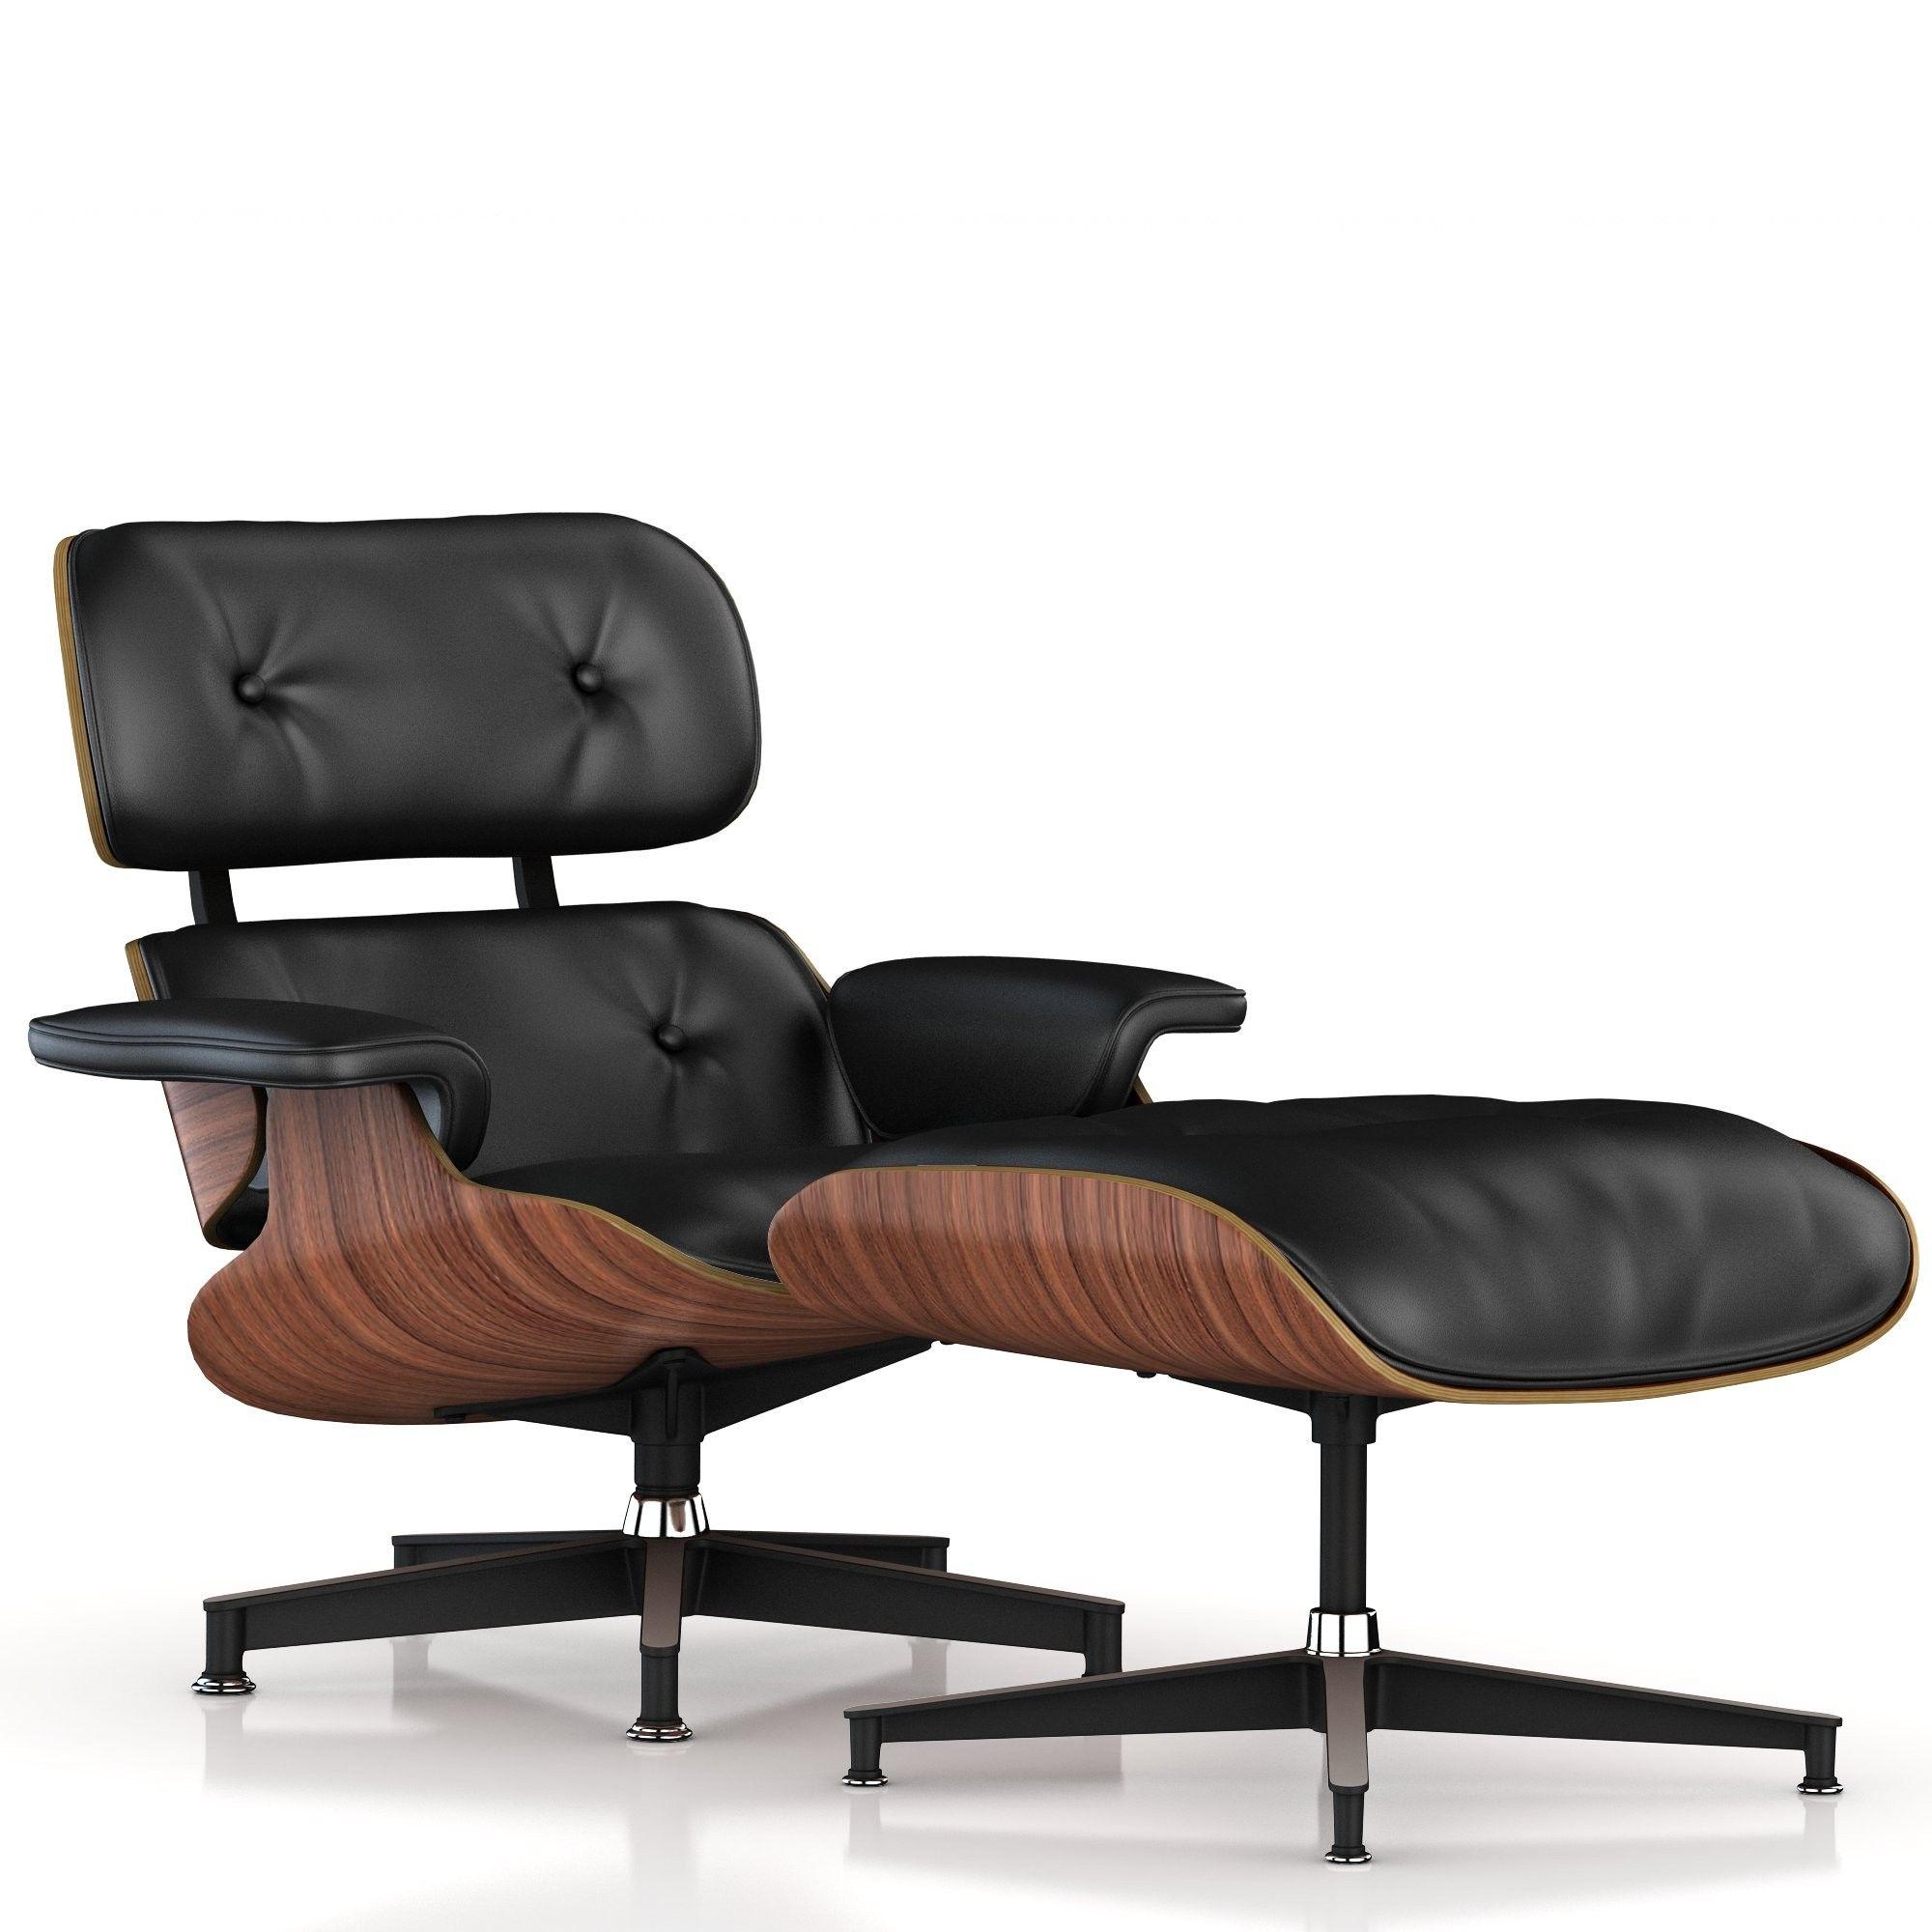 Eames Lounge Chair U0026 Ottoman / Charles U0026 Ray Eames / 1956